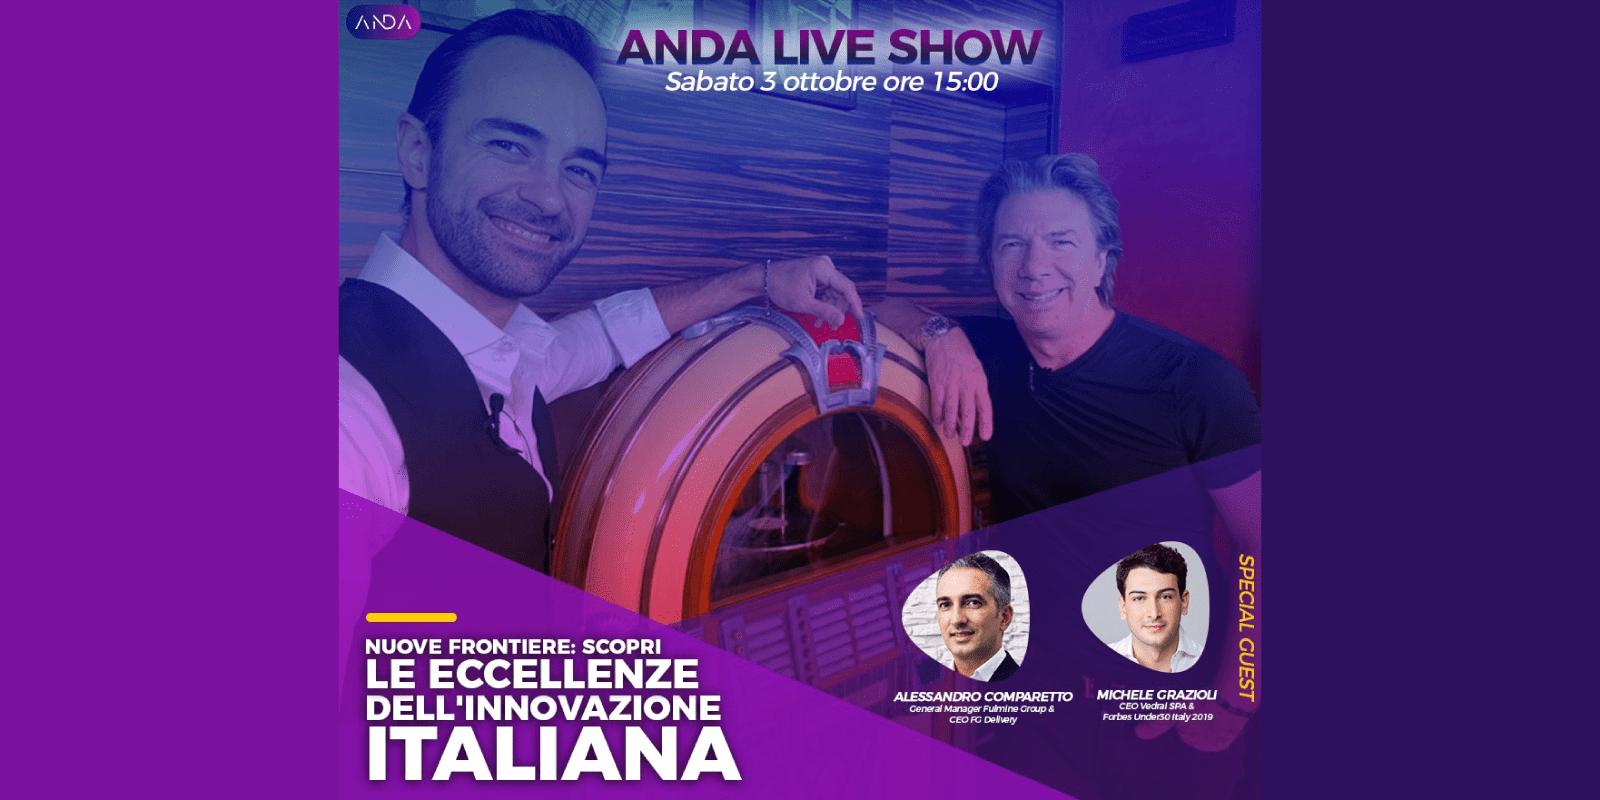 Anda-Live-Show-Daniele-Viganò-Fulmine-Group